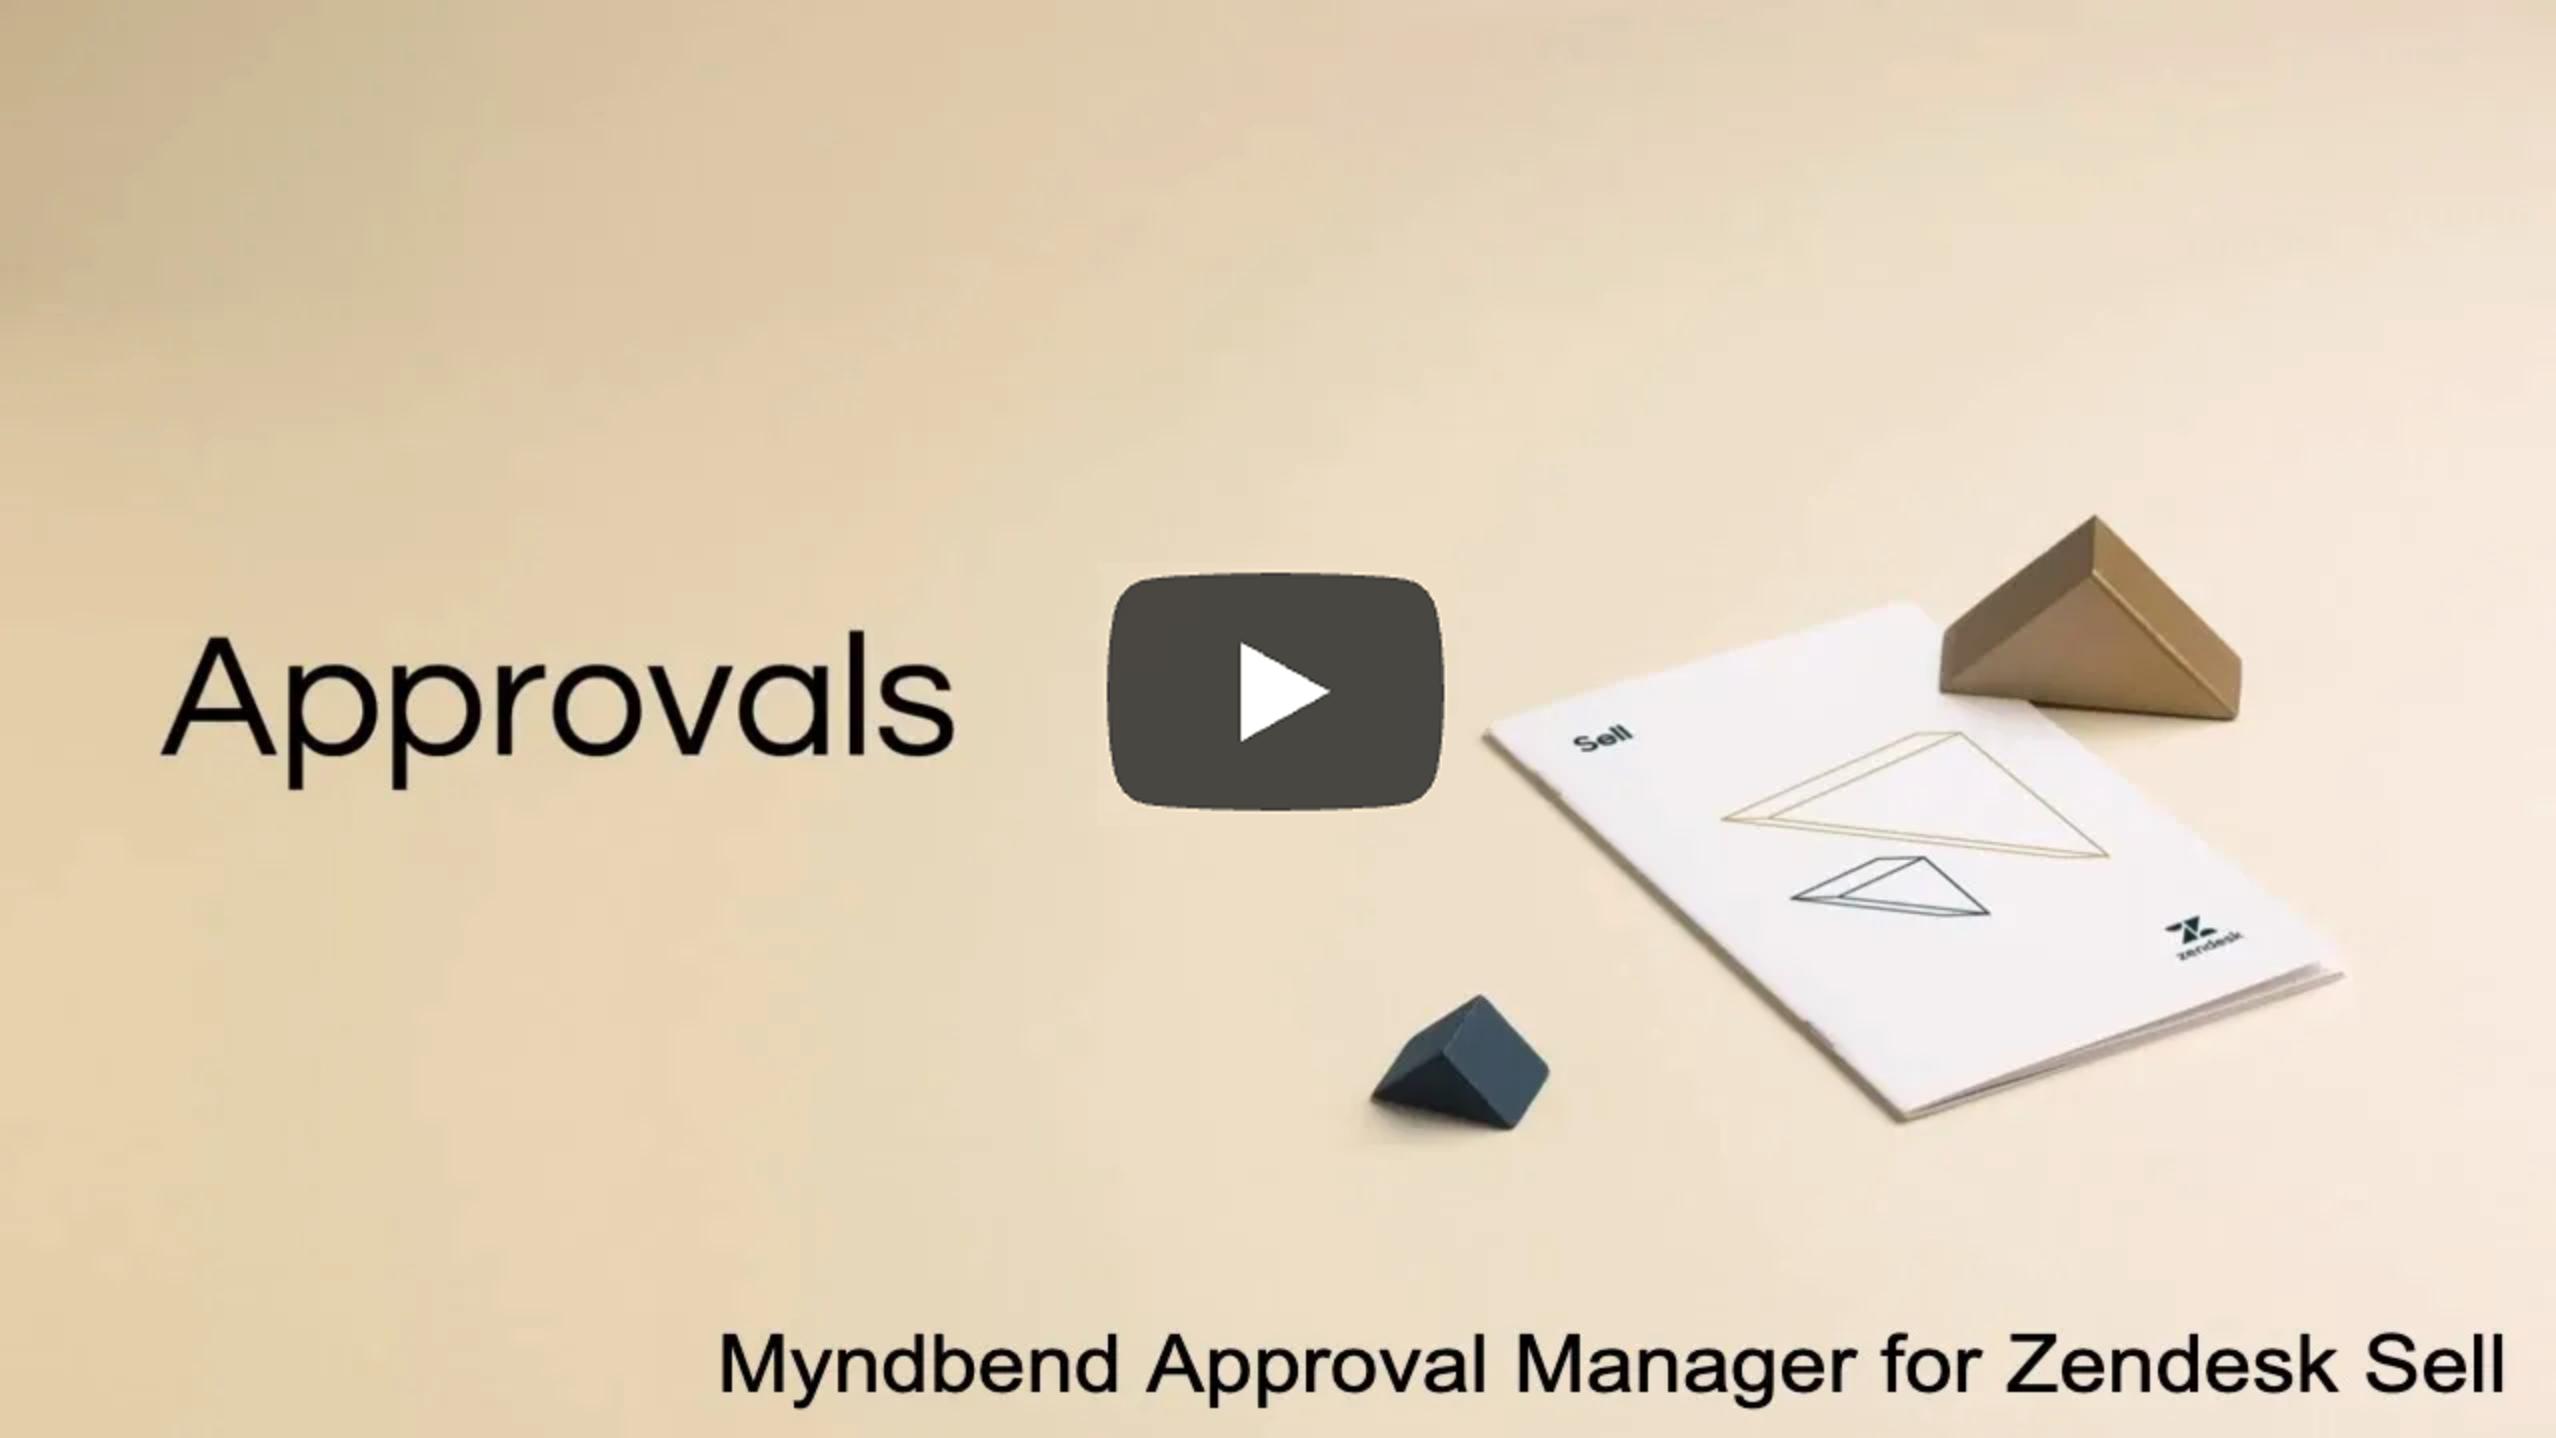 Myndbend Approval Manager